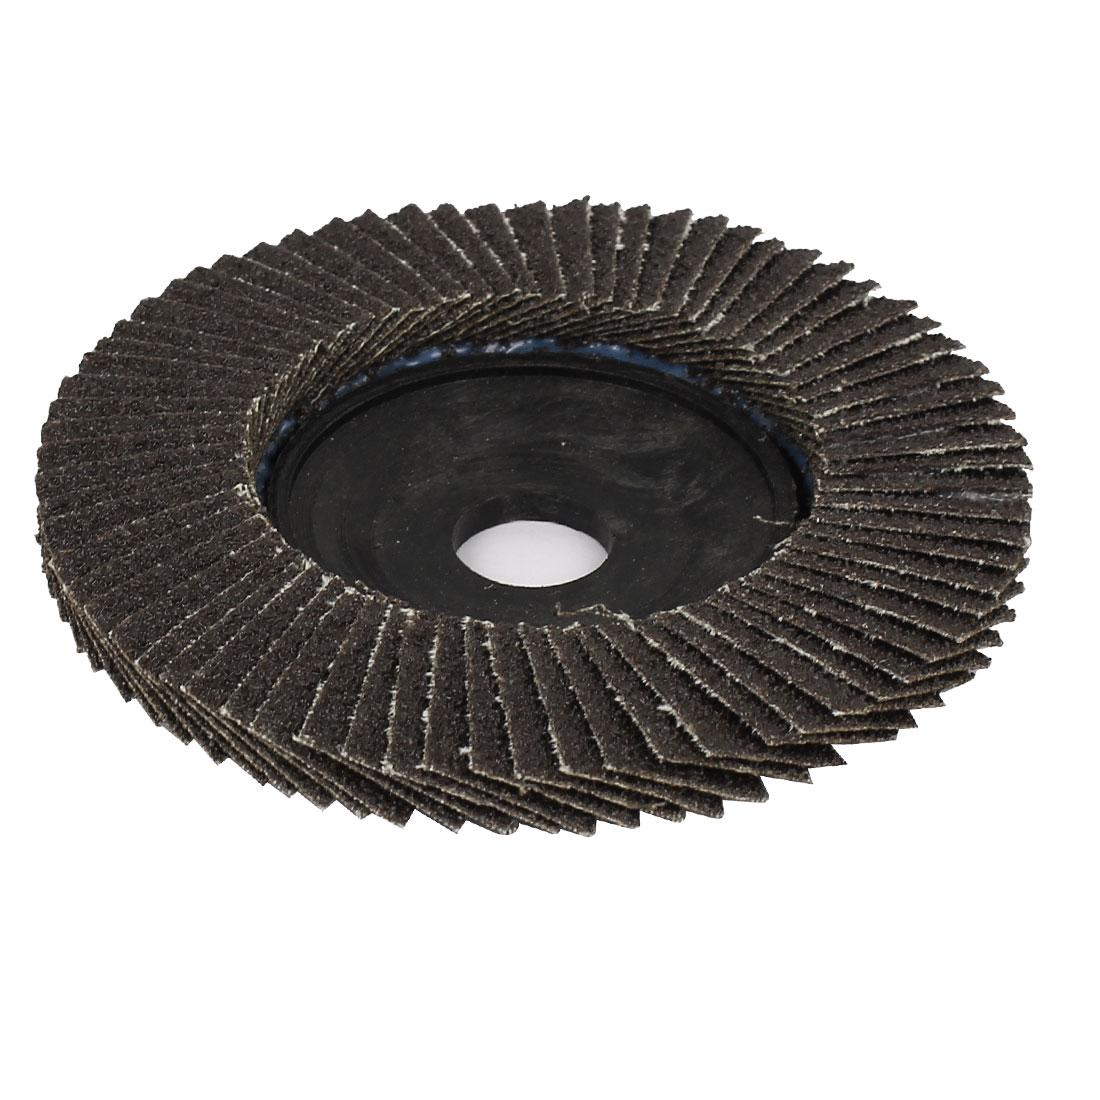 100mm x 16mm Flap Sanding Disc Polishing Grinding Wheel 60 Grit